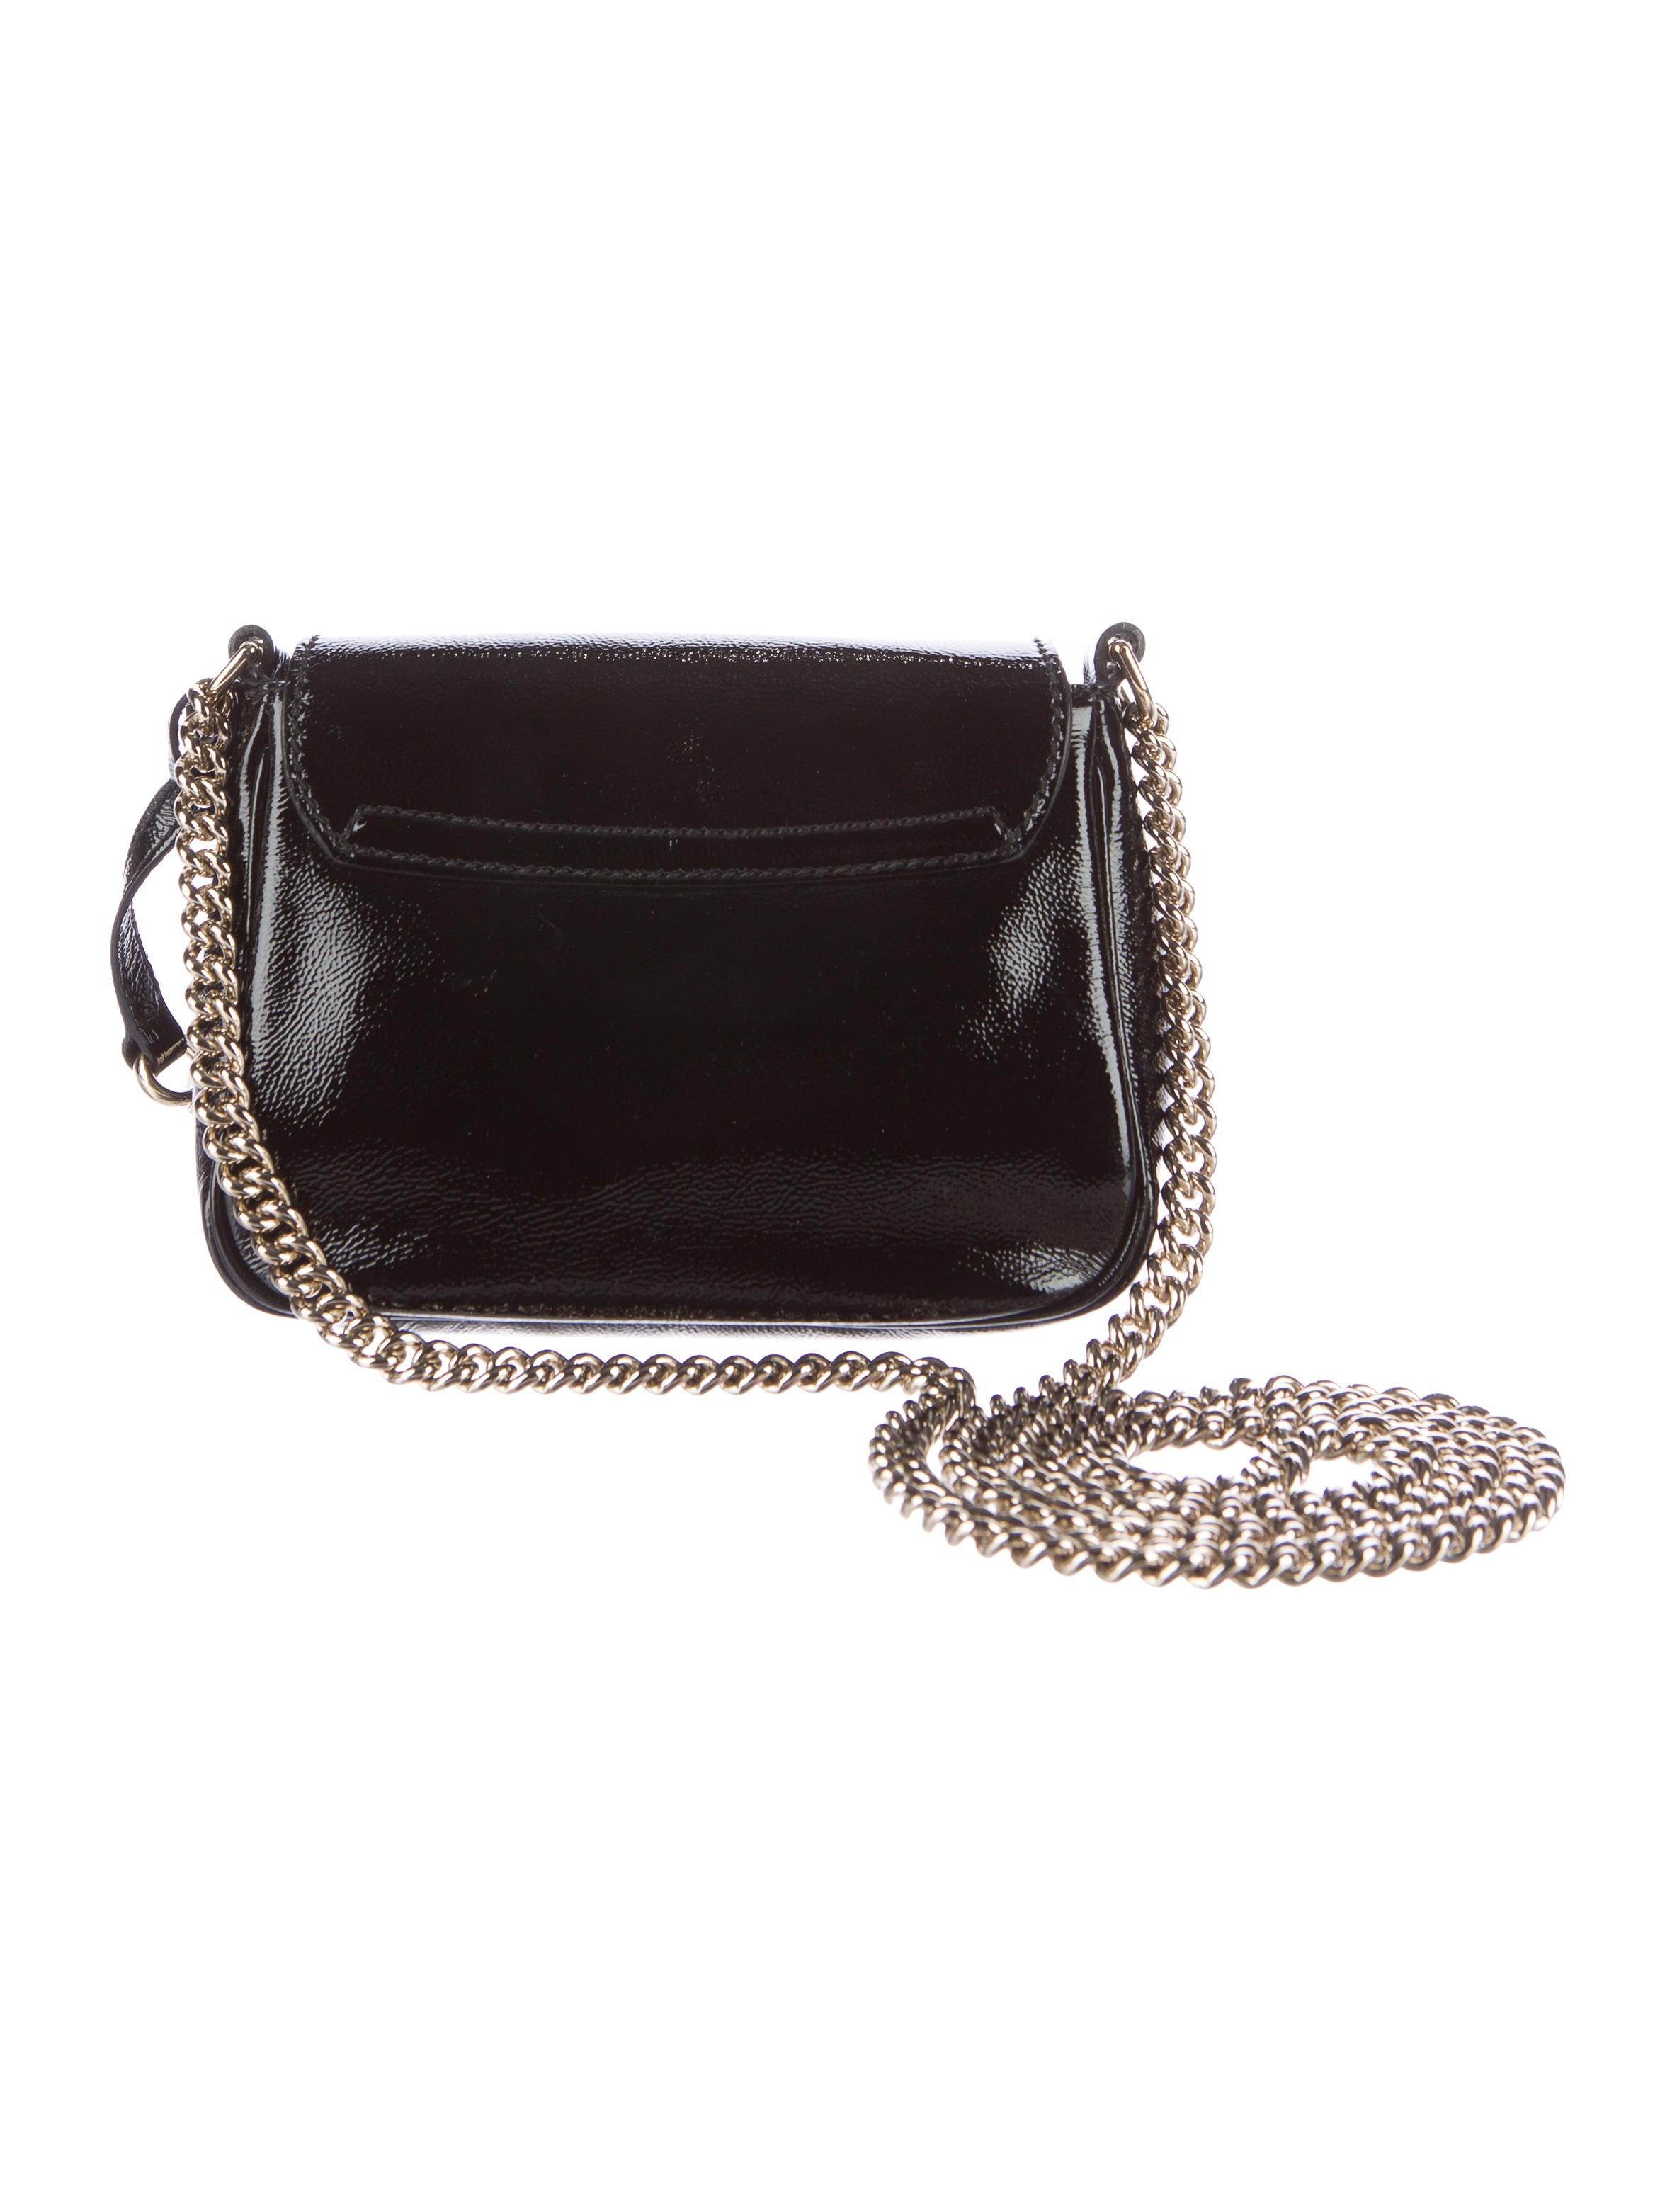 Gucci Soho Chain Crossbody Bag Handbags Guc146040